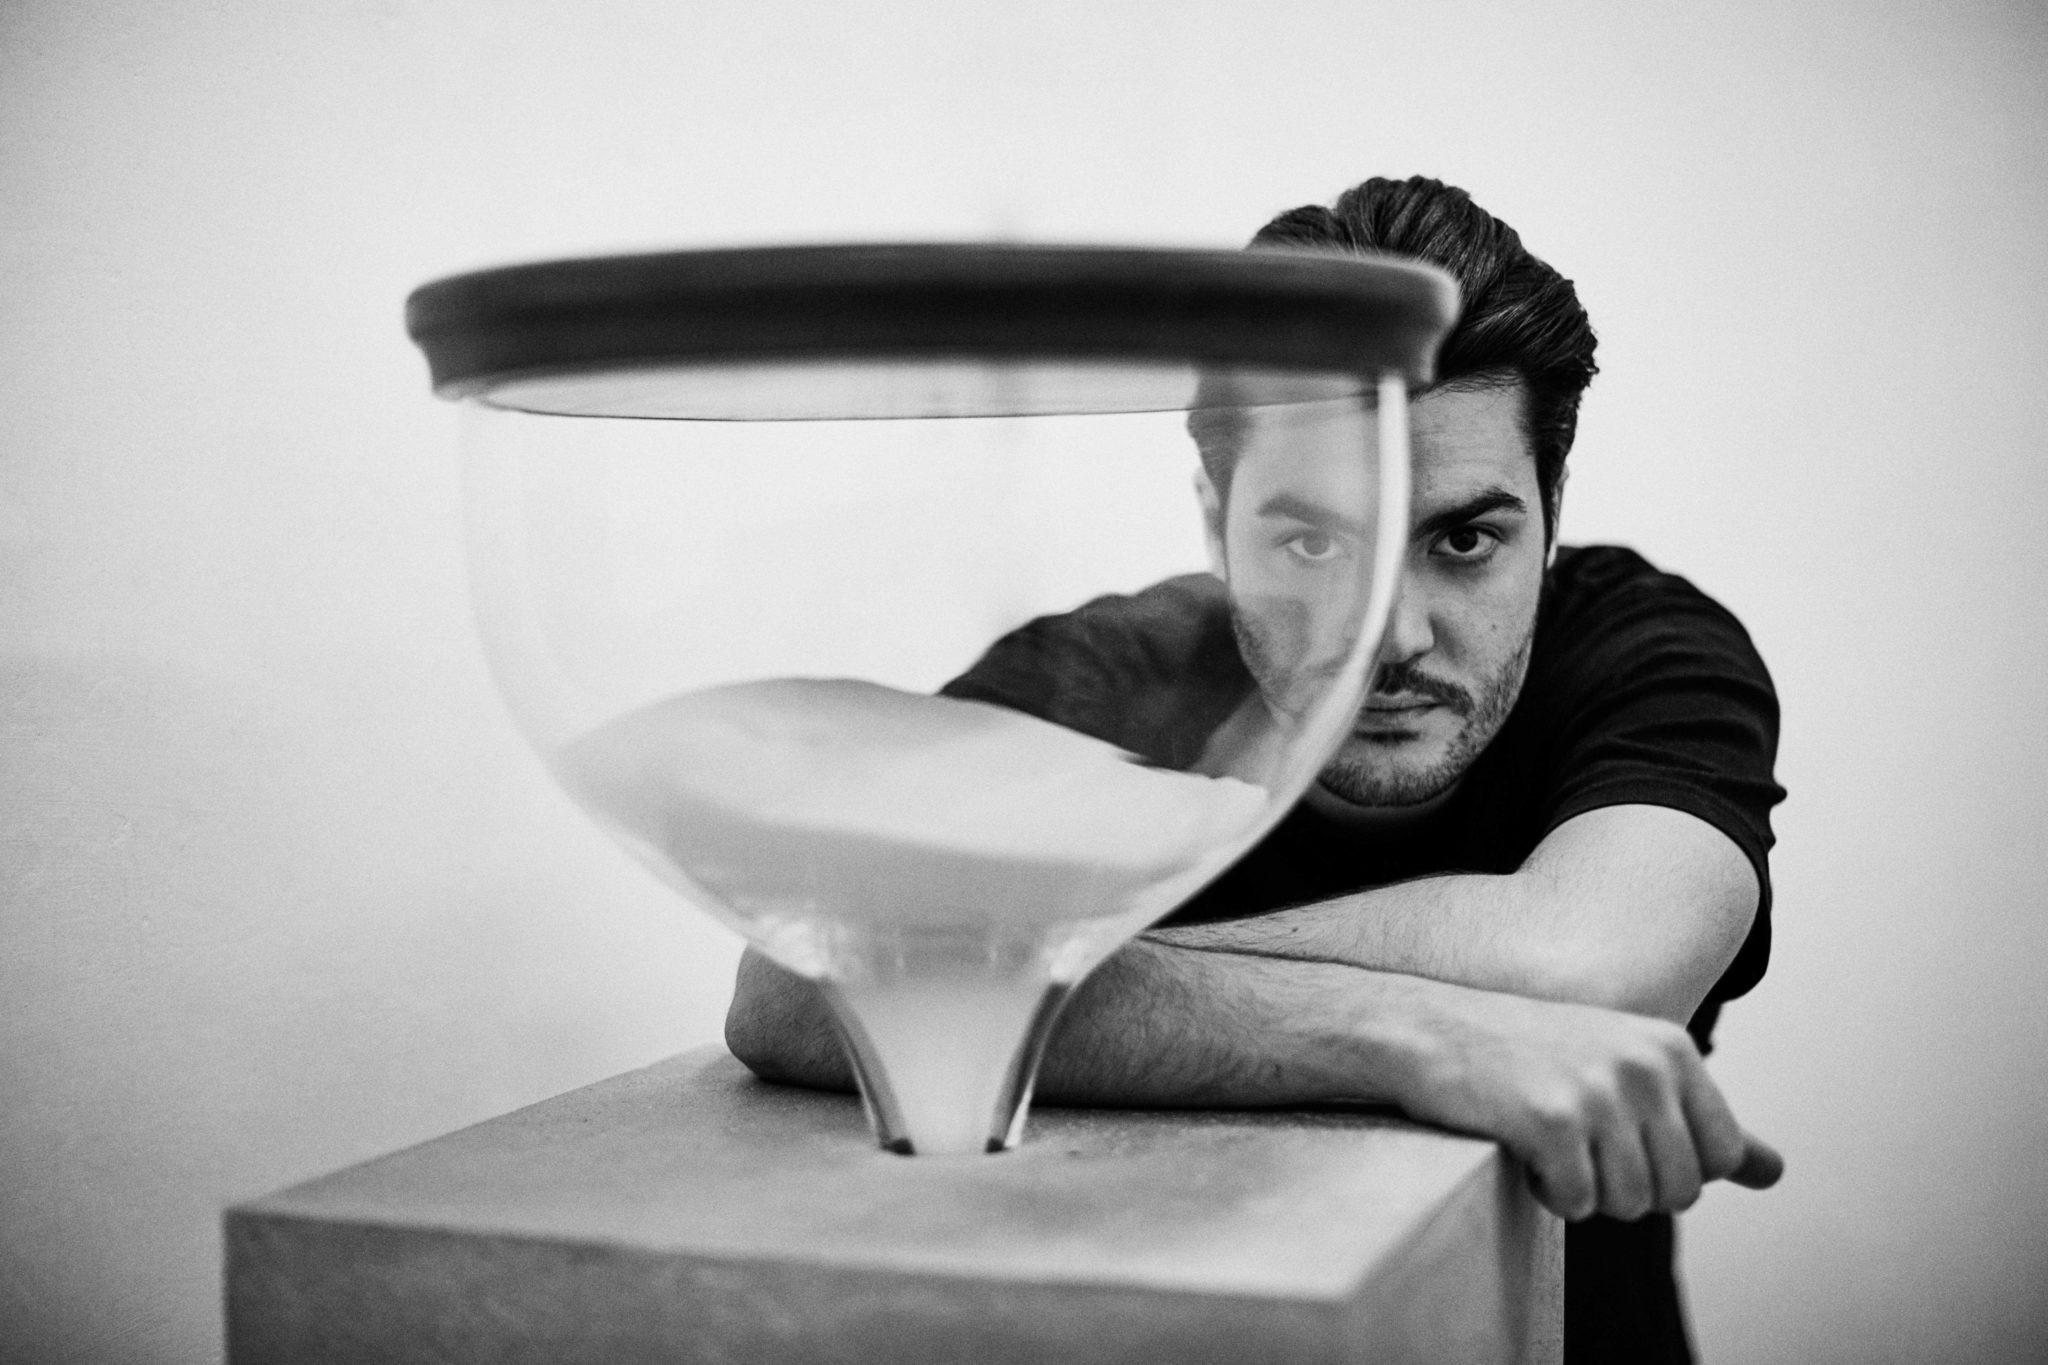 Francesco Vullo – archetype and contraposition